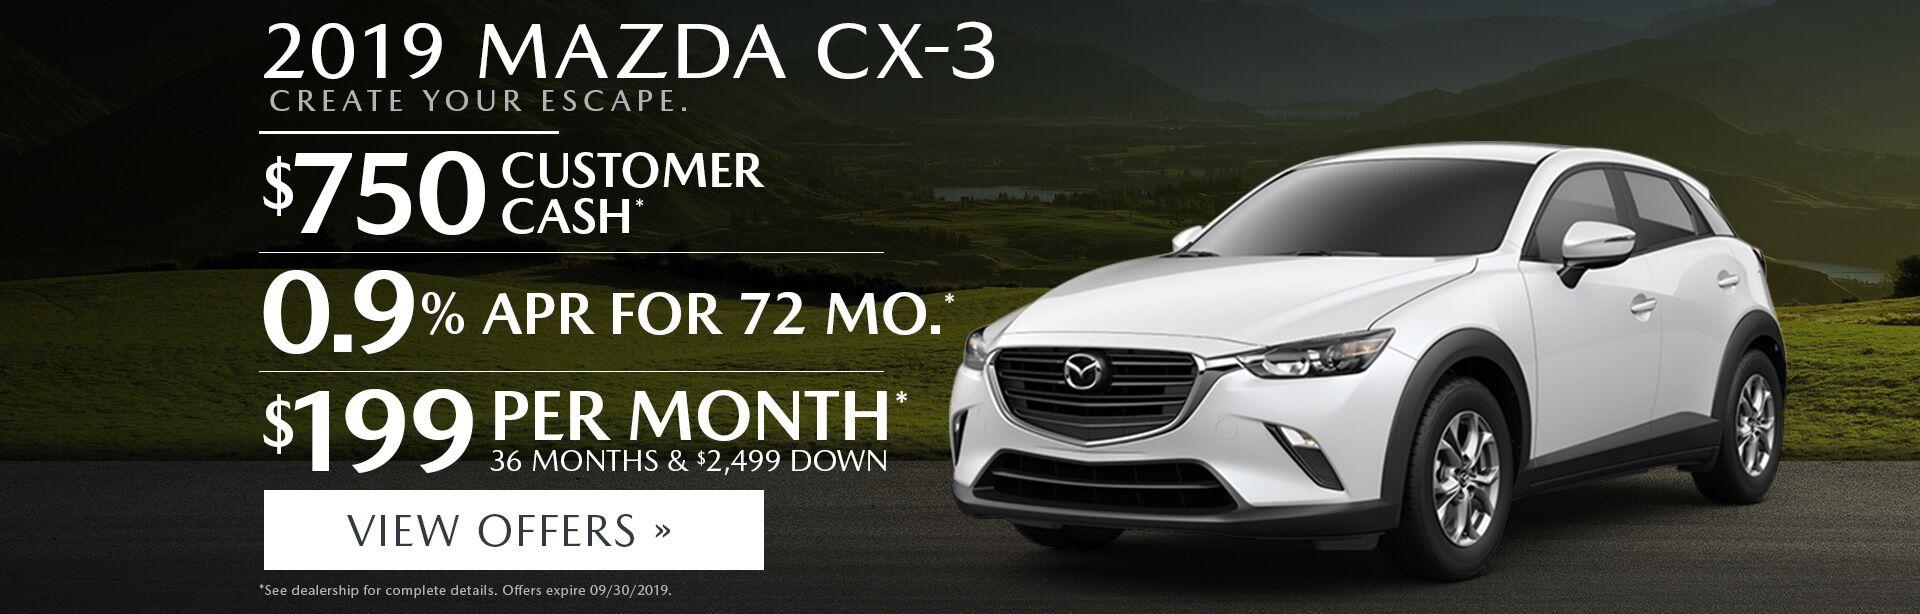 Used Car Dealerships In Mesa Az >> Mazda Dealer In Mesa Serving Chandler Tempe And Scottsdale